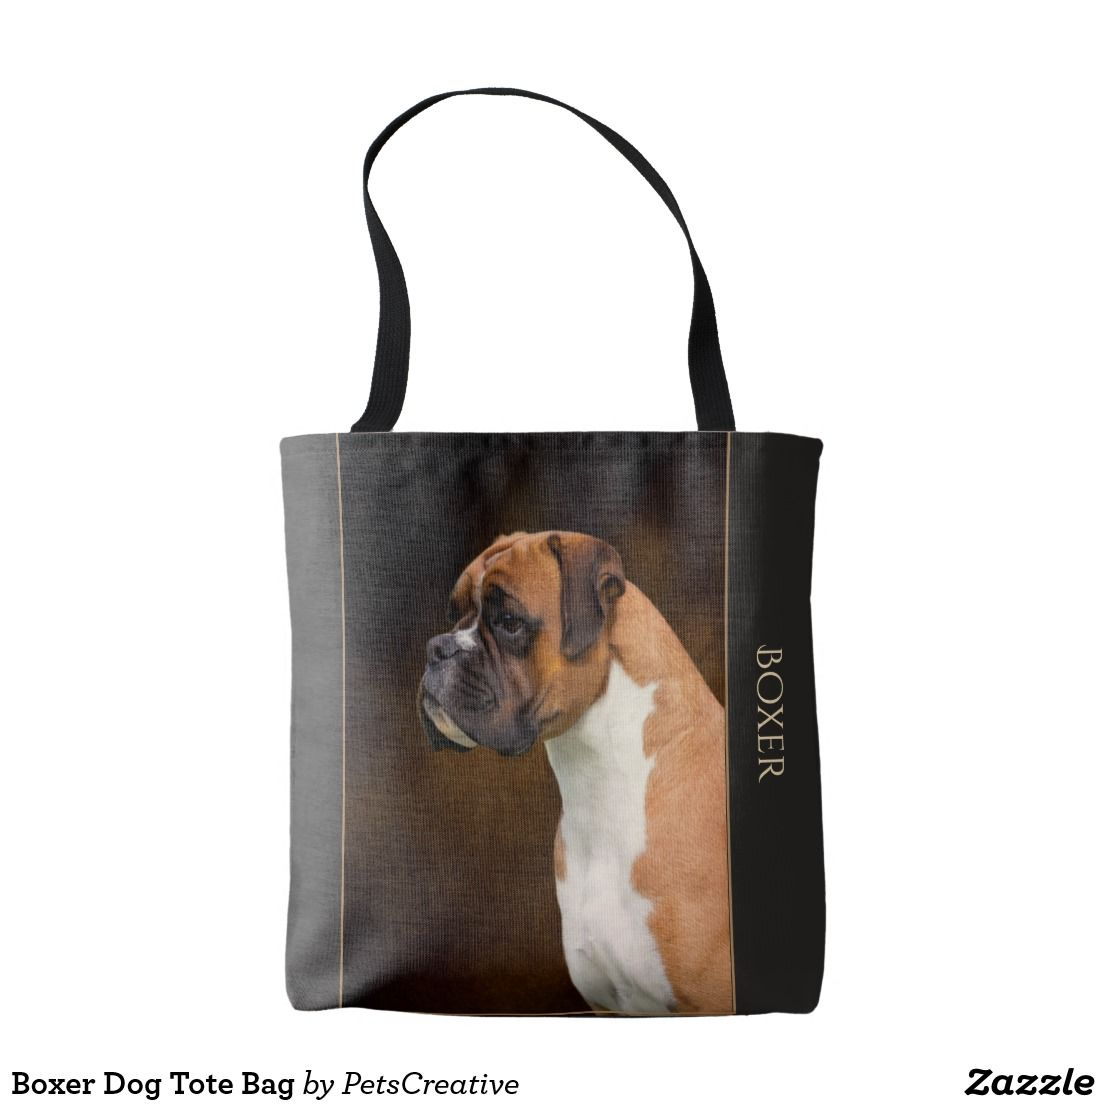 Boxer Dog Tote Bag Zazzle Com Au Dog Tote Bag Tote Bag Boxer